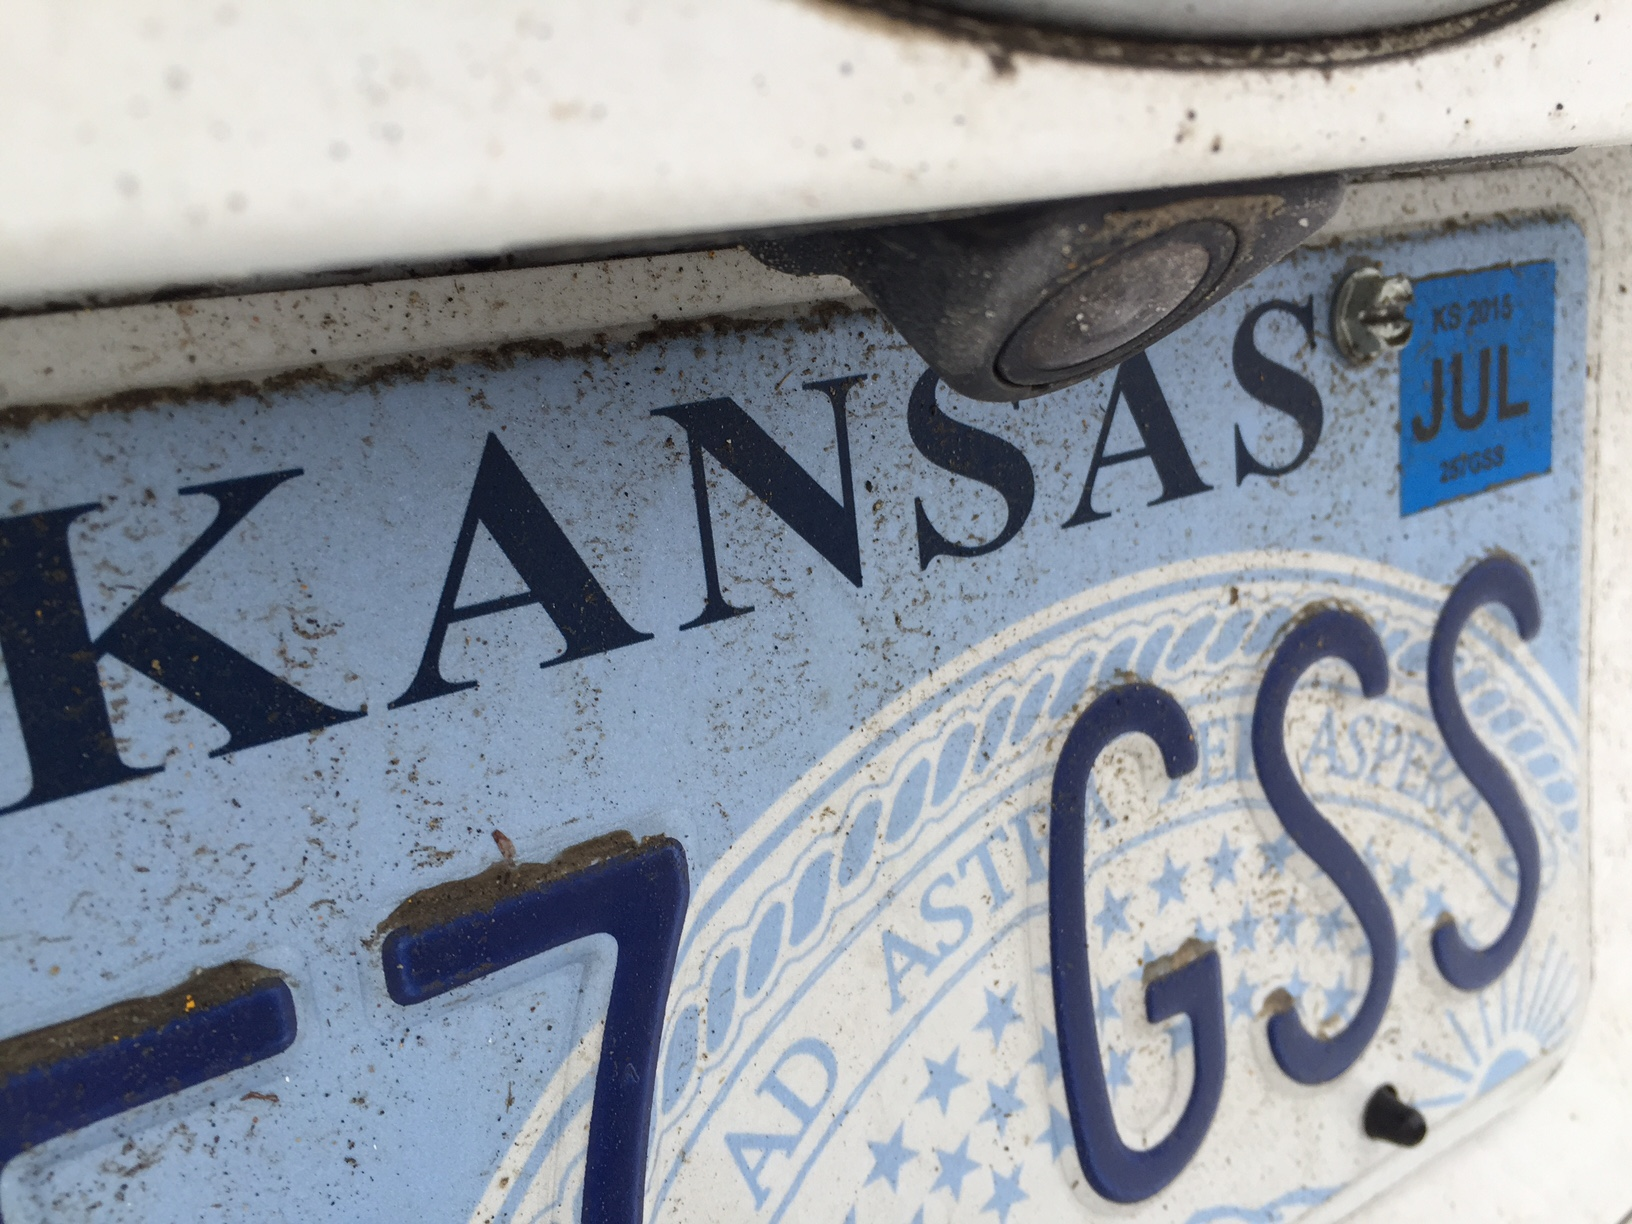 Kansas License Plate_187272